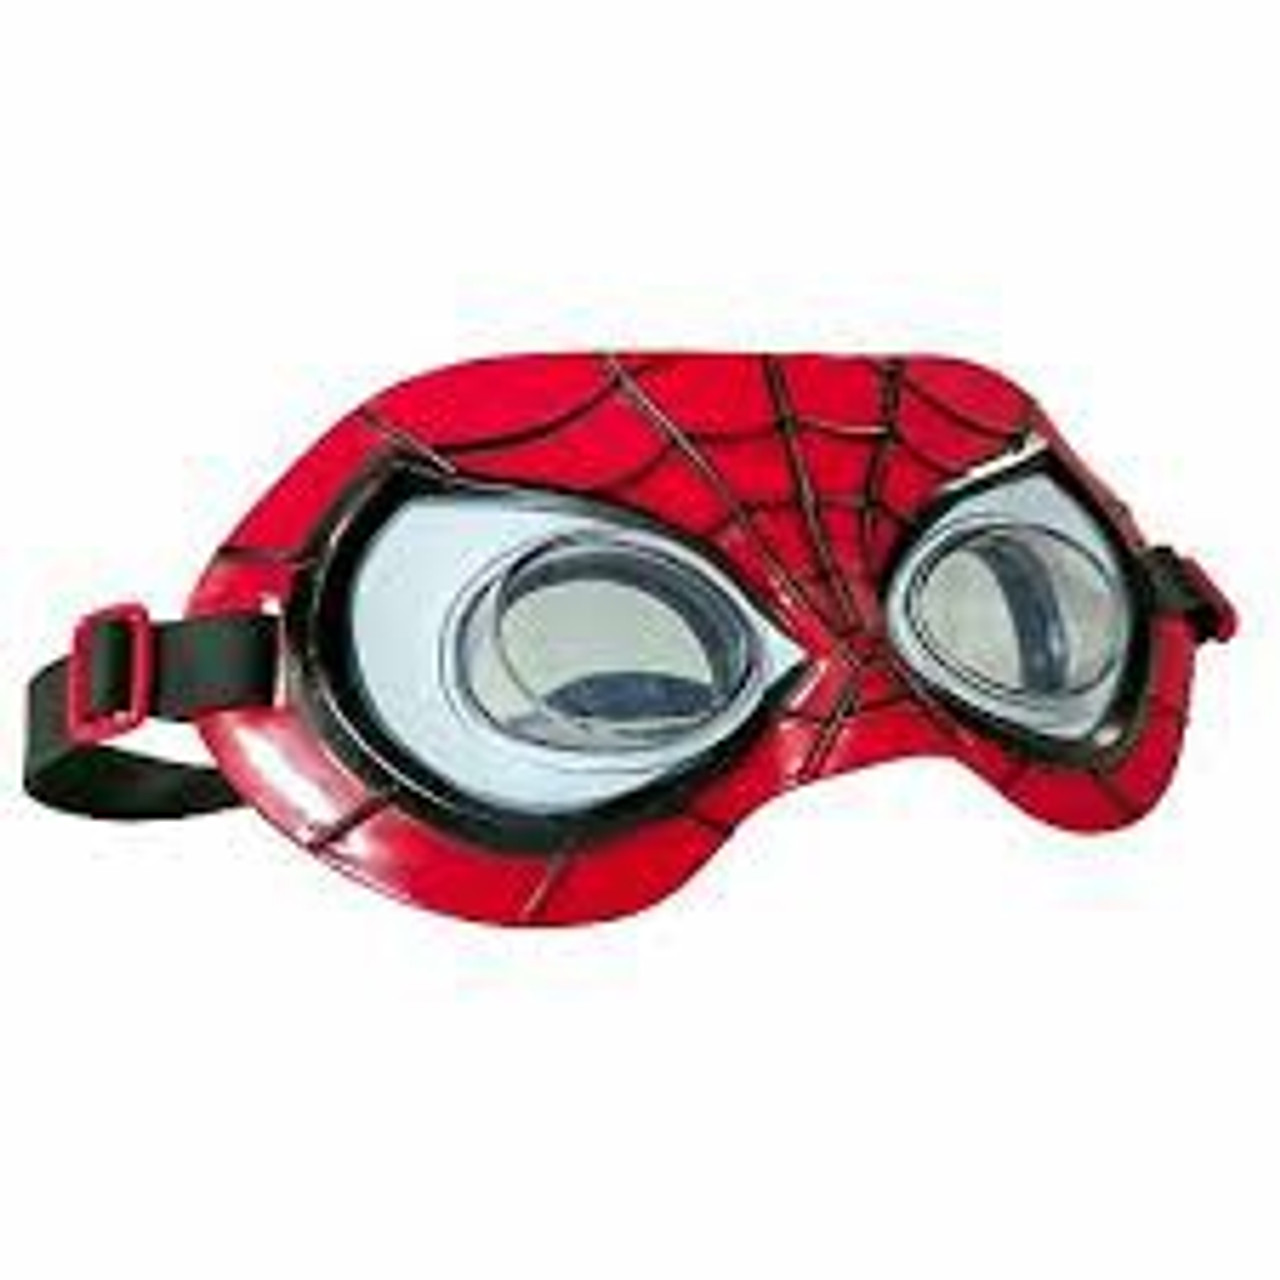 SPIDER-MAN DELUXE SUPERHERO SWIM GOGGLES